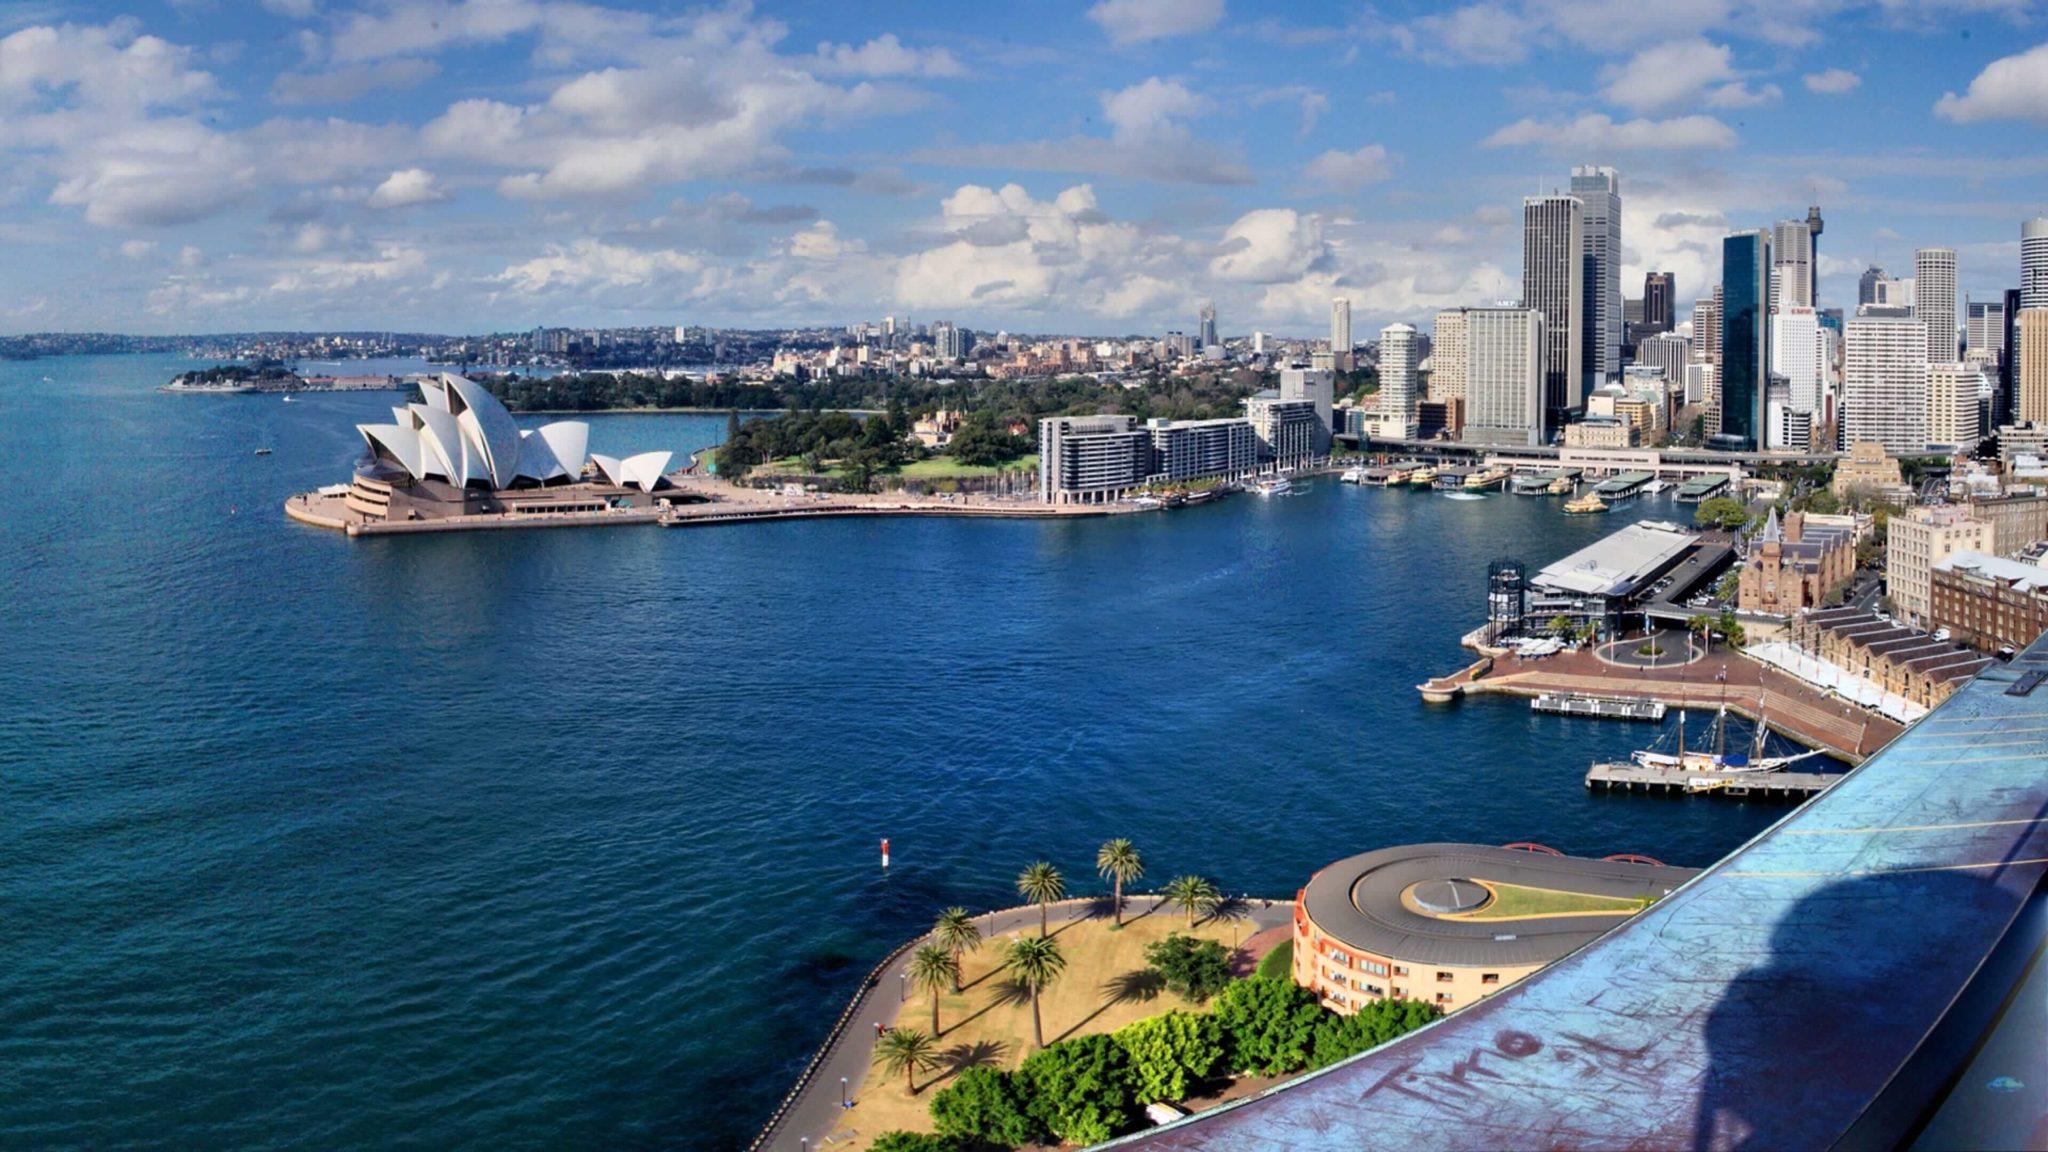 Nhà hát Opera Sydney - Du lịch Australia